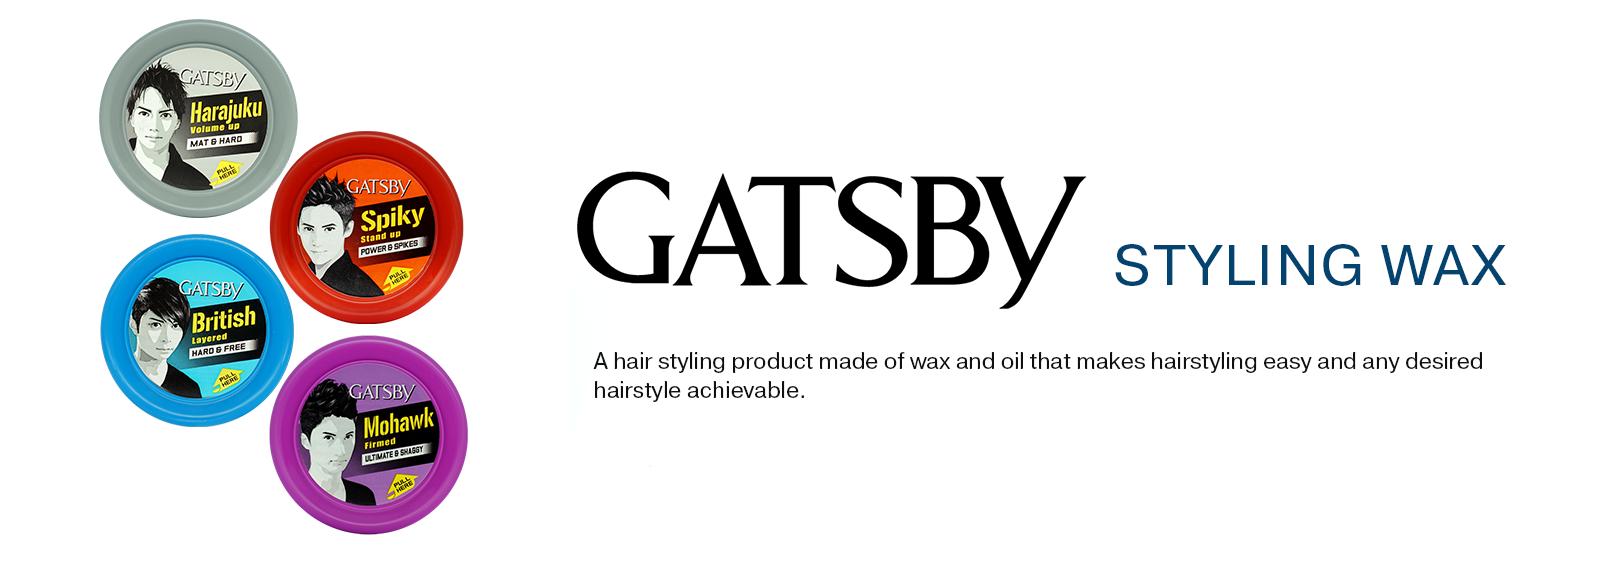 GATSBY Styling Wax Banner